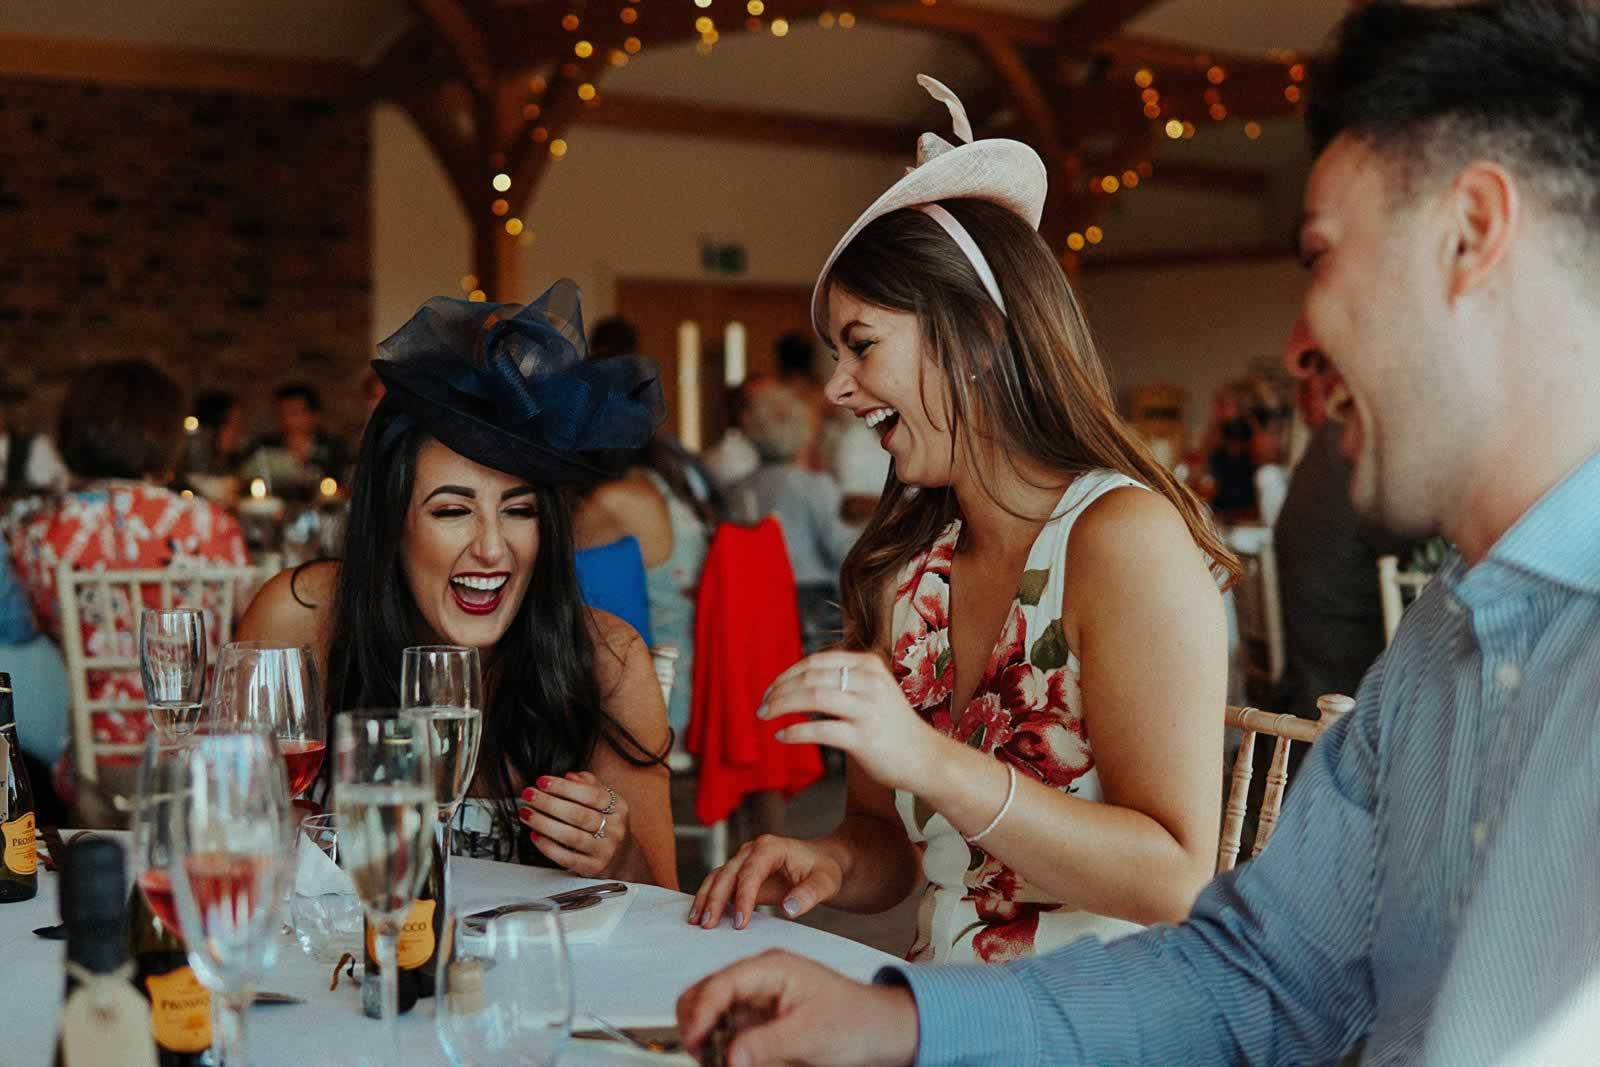 Pryors-Hayes-Wedding-Photography-Barn-Venue-Cheshire-embee-photography-0204.jpg